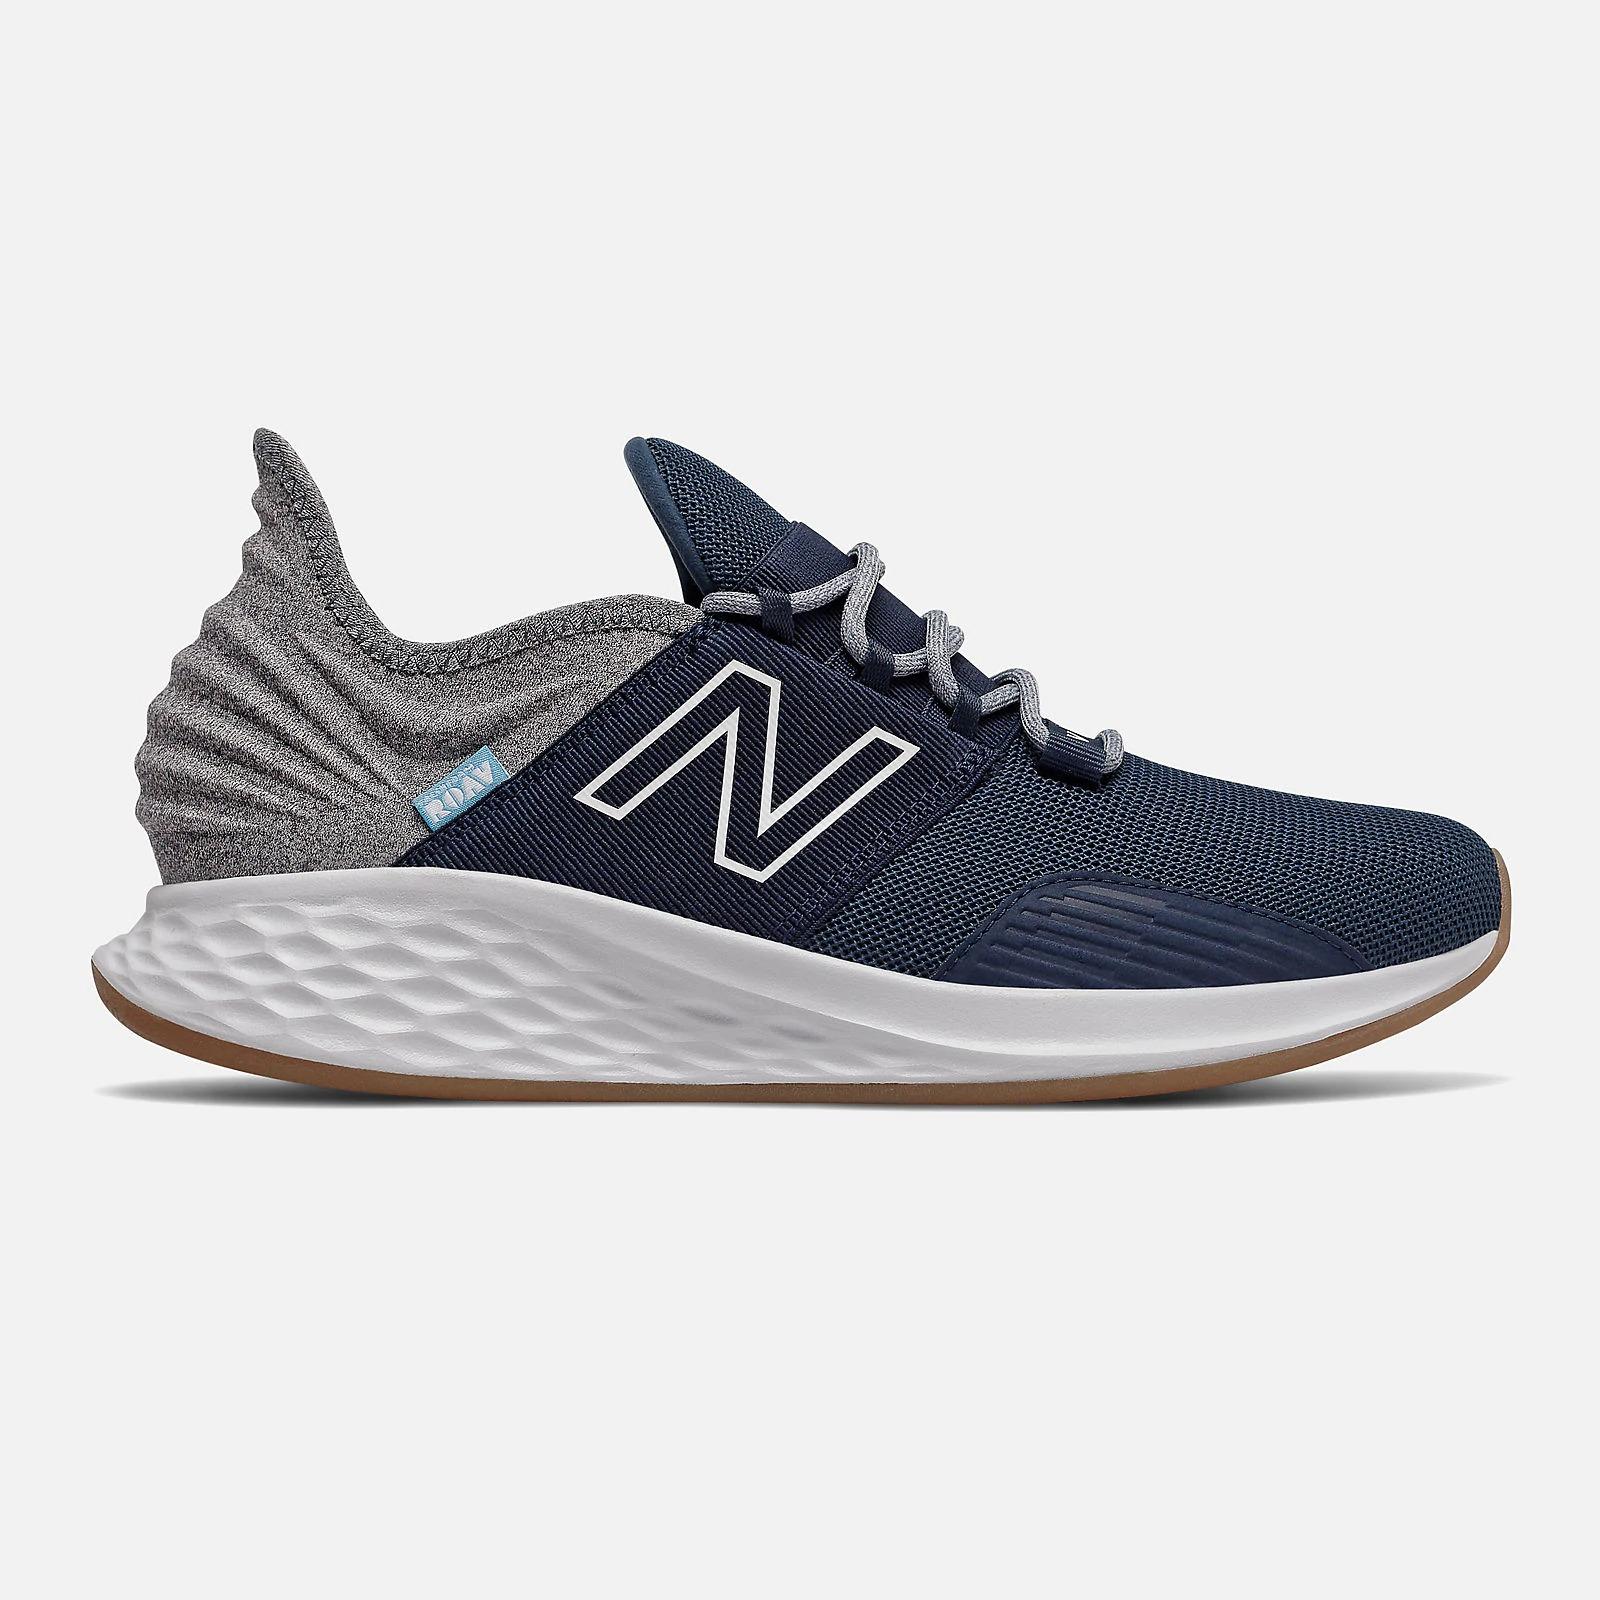 New Balance Fresh Foam Roav Tee Shirt sneaker with indigo and aluminum colors